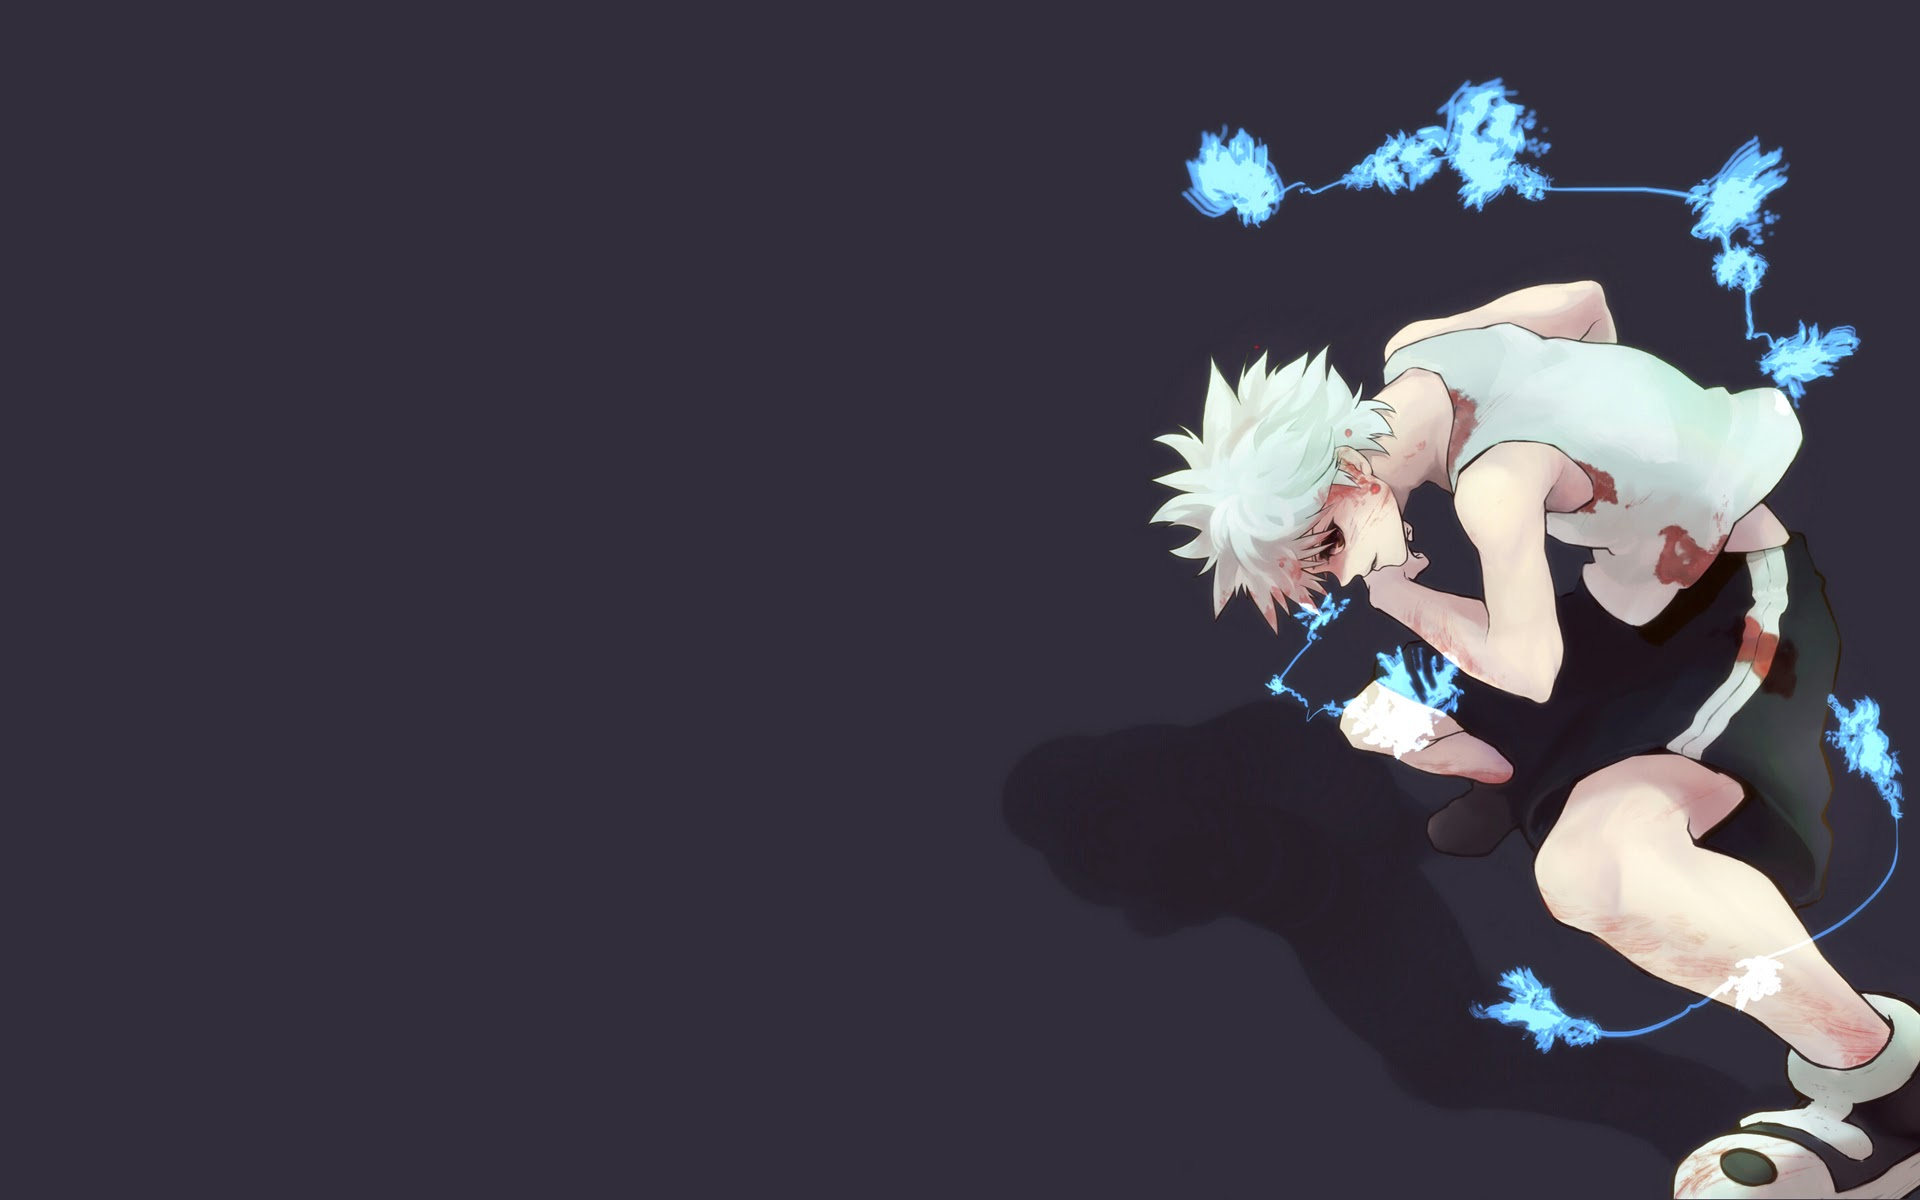 killua lightning hunter x hunter 2011 anime hd wallpaper 1920x1200 14 1920x1200